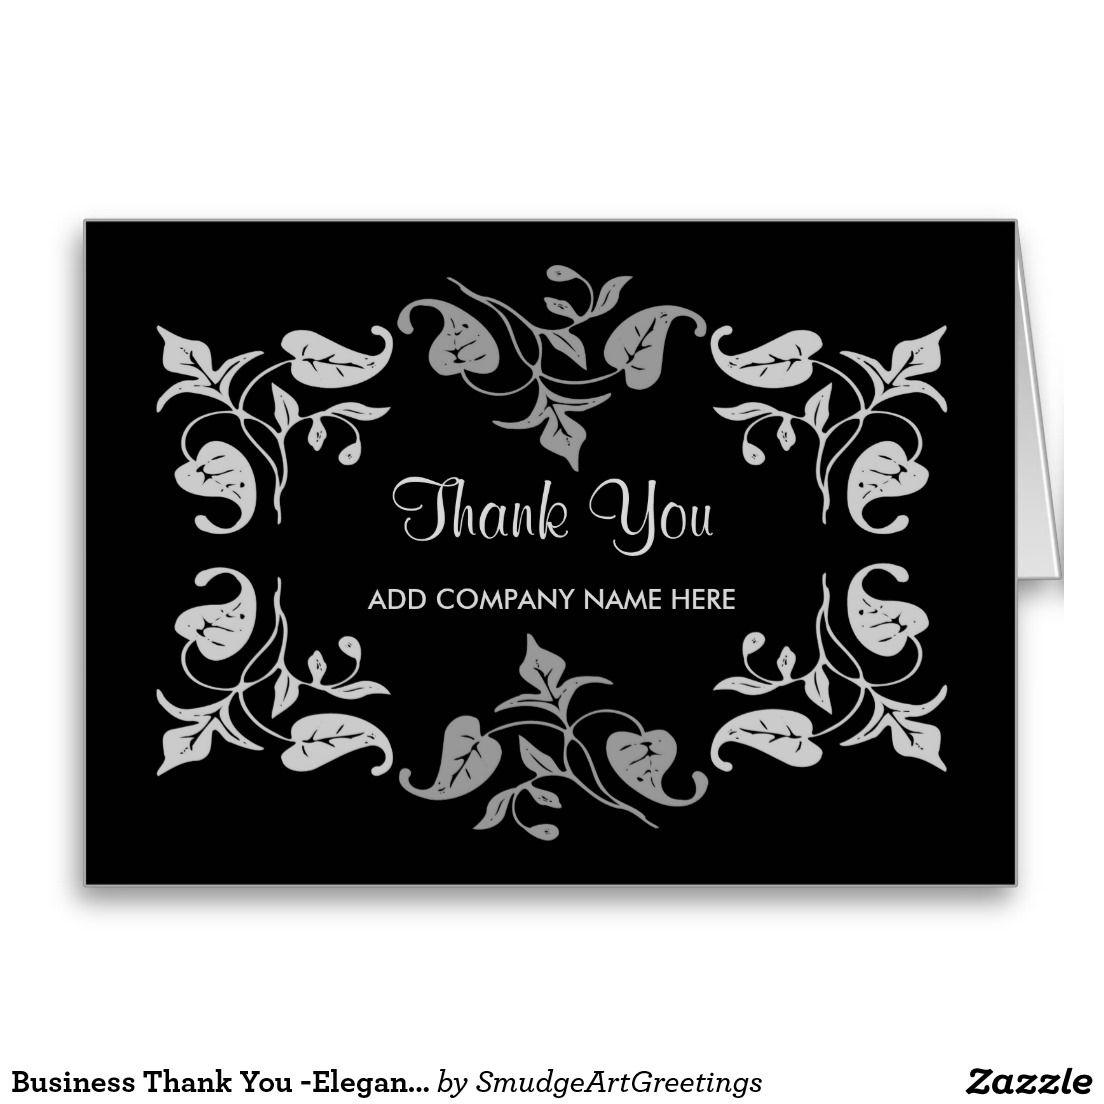 Business Thank You Elegant Silver Leaves On Black Card Black Card